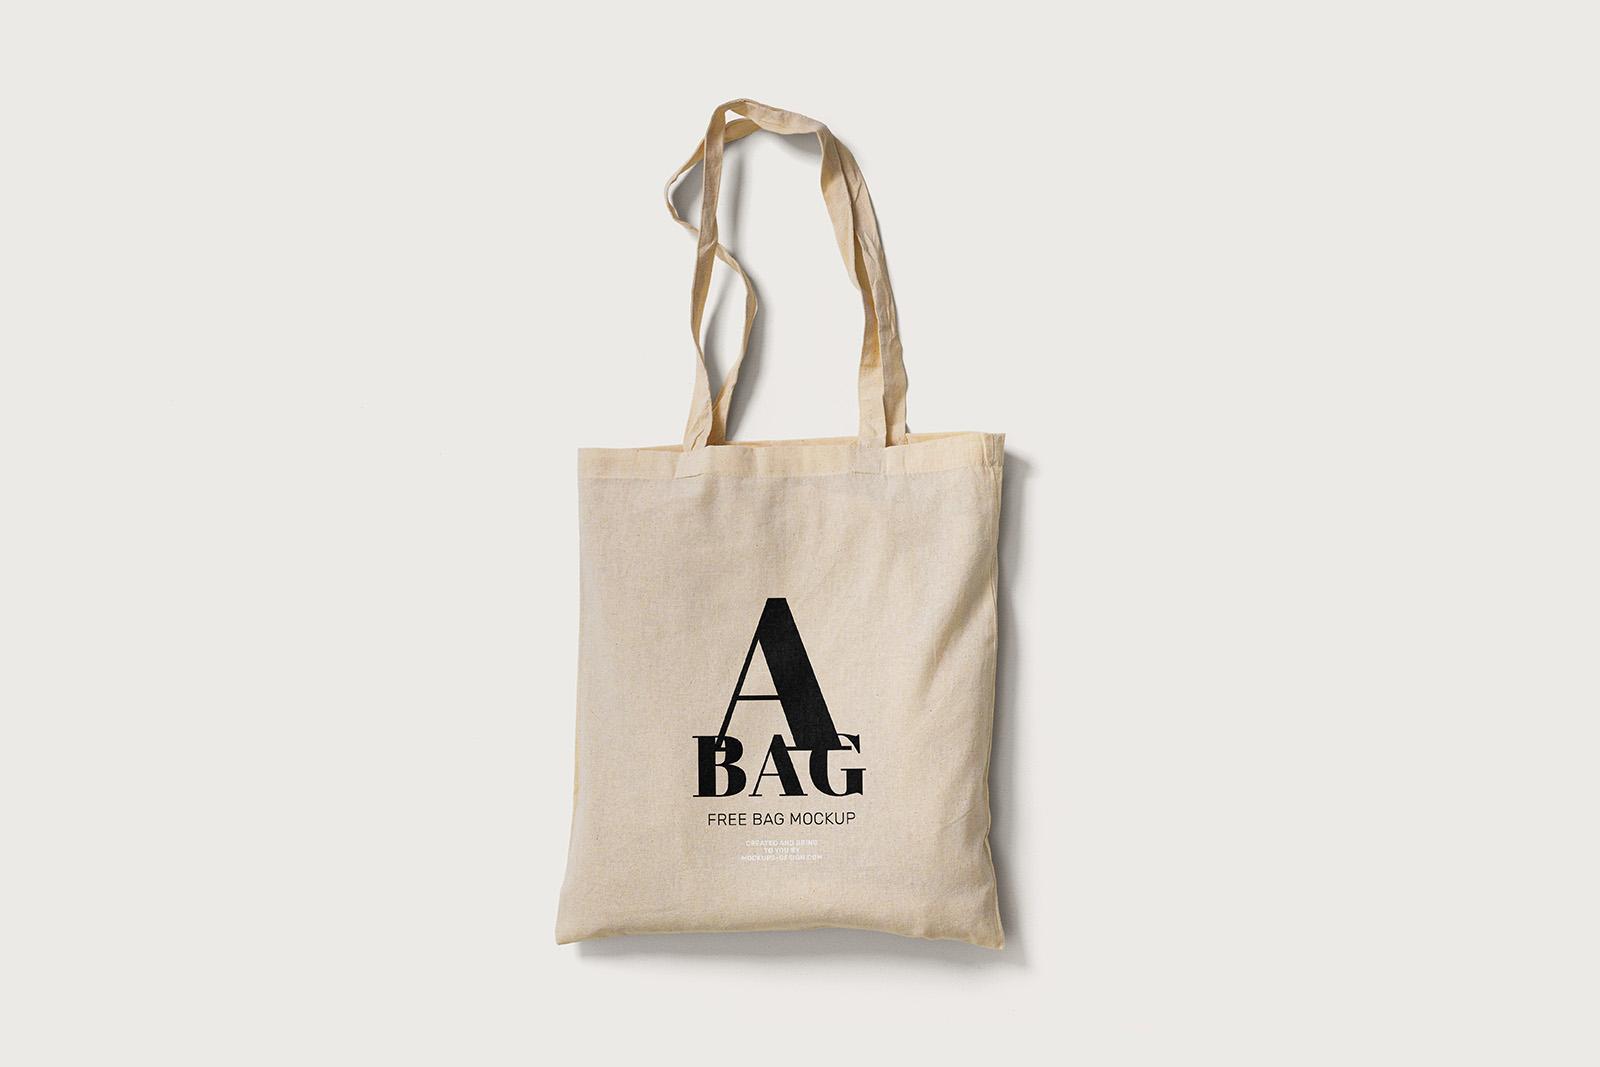 Comes as psd photoshop mockup files or alternative file formats. Free Tote Bag Mockup Mockups Design